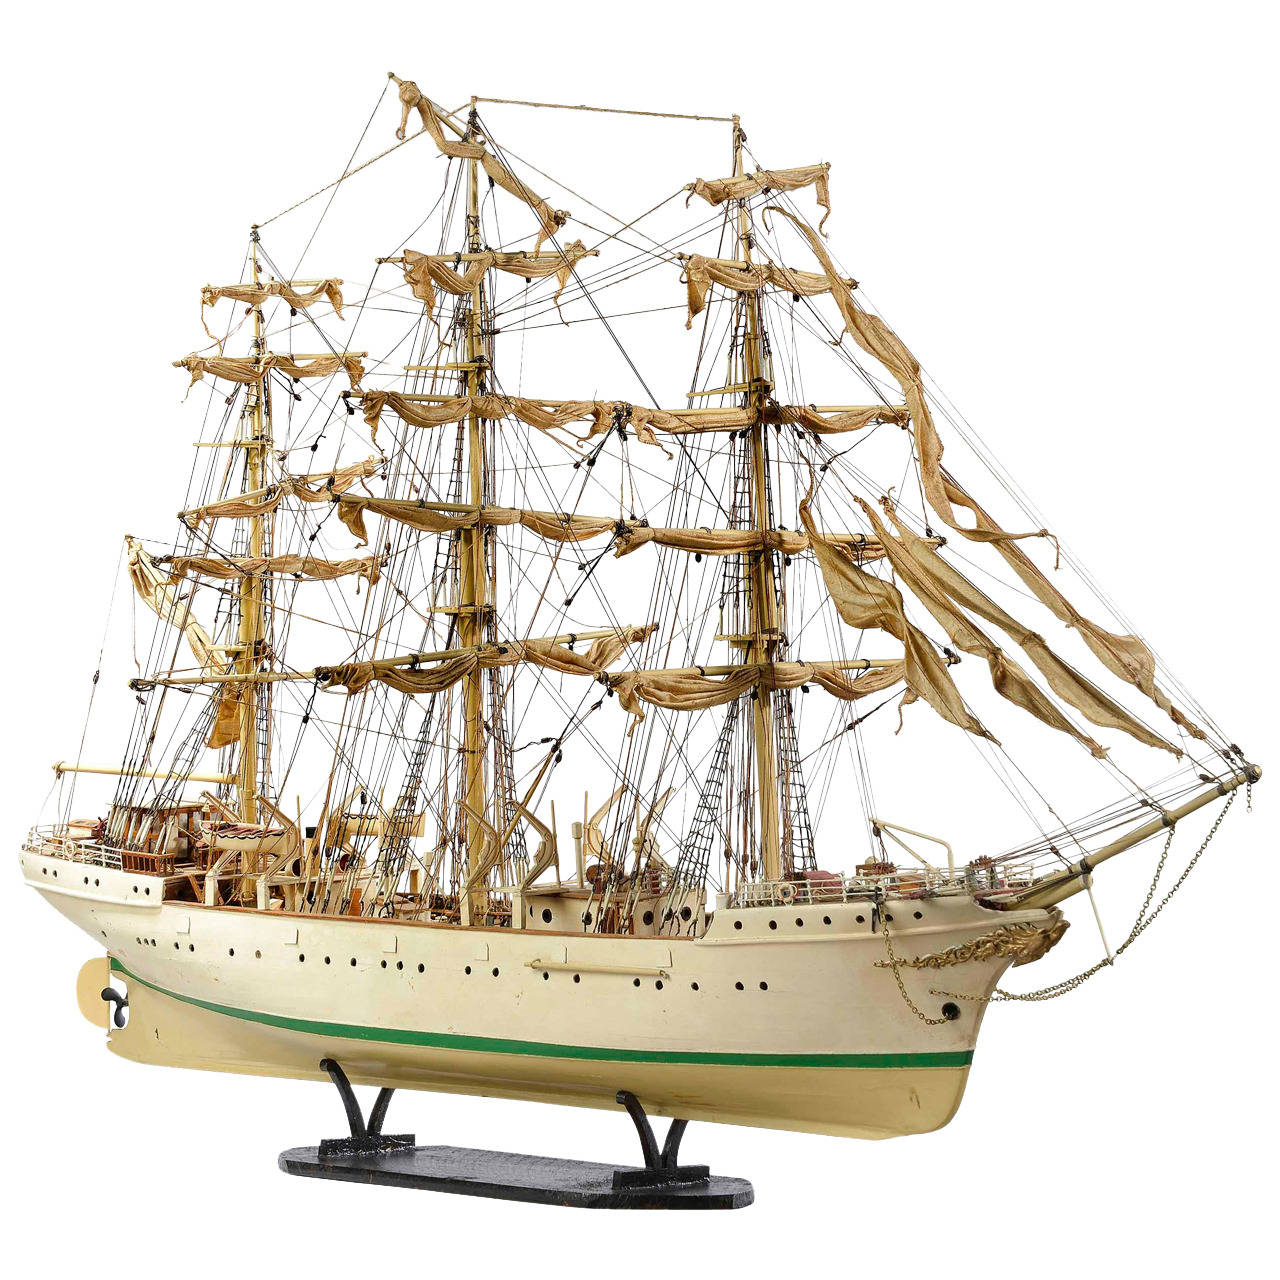 Mid-20th Century Ship Model